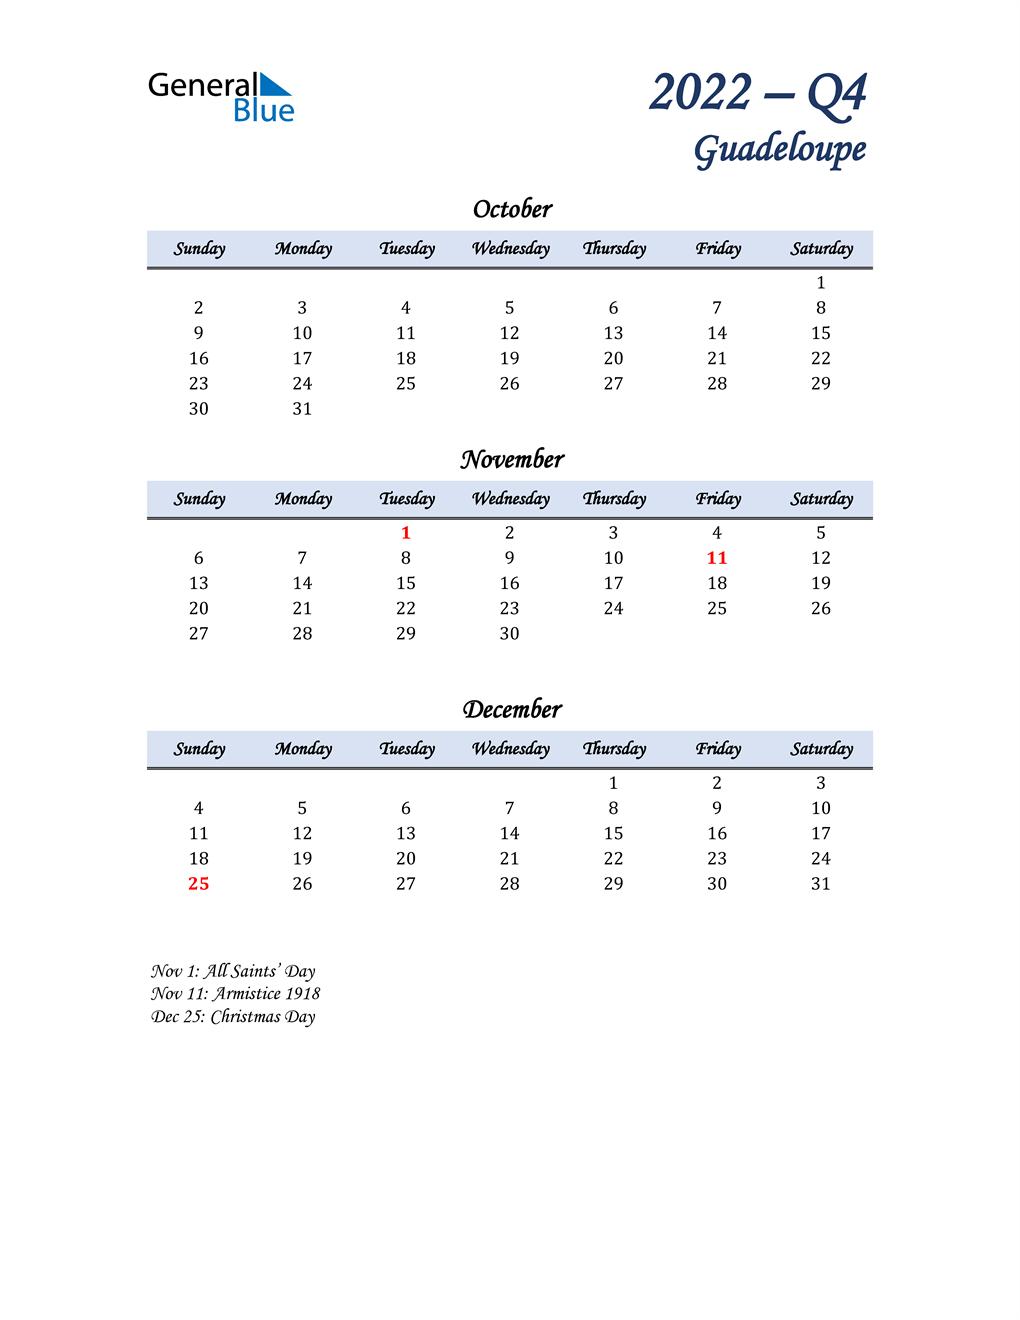 October, November, and December Calendar for Guadeloupe